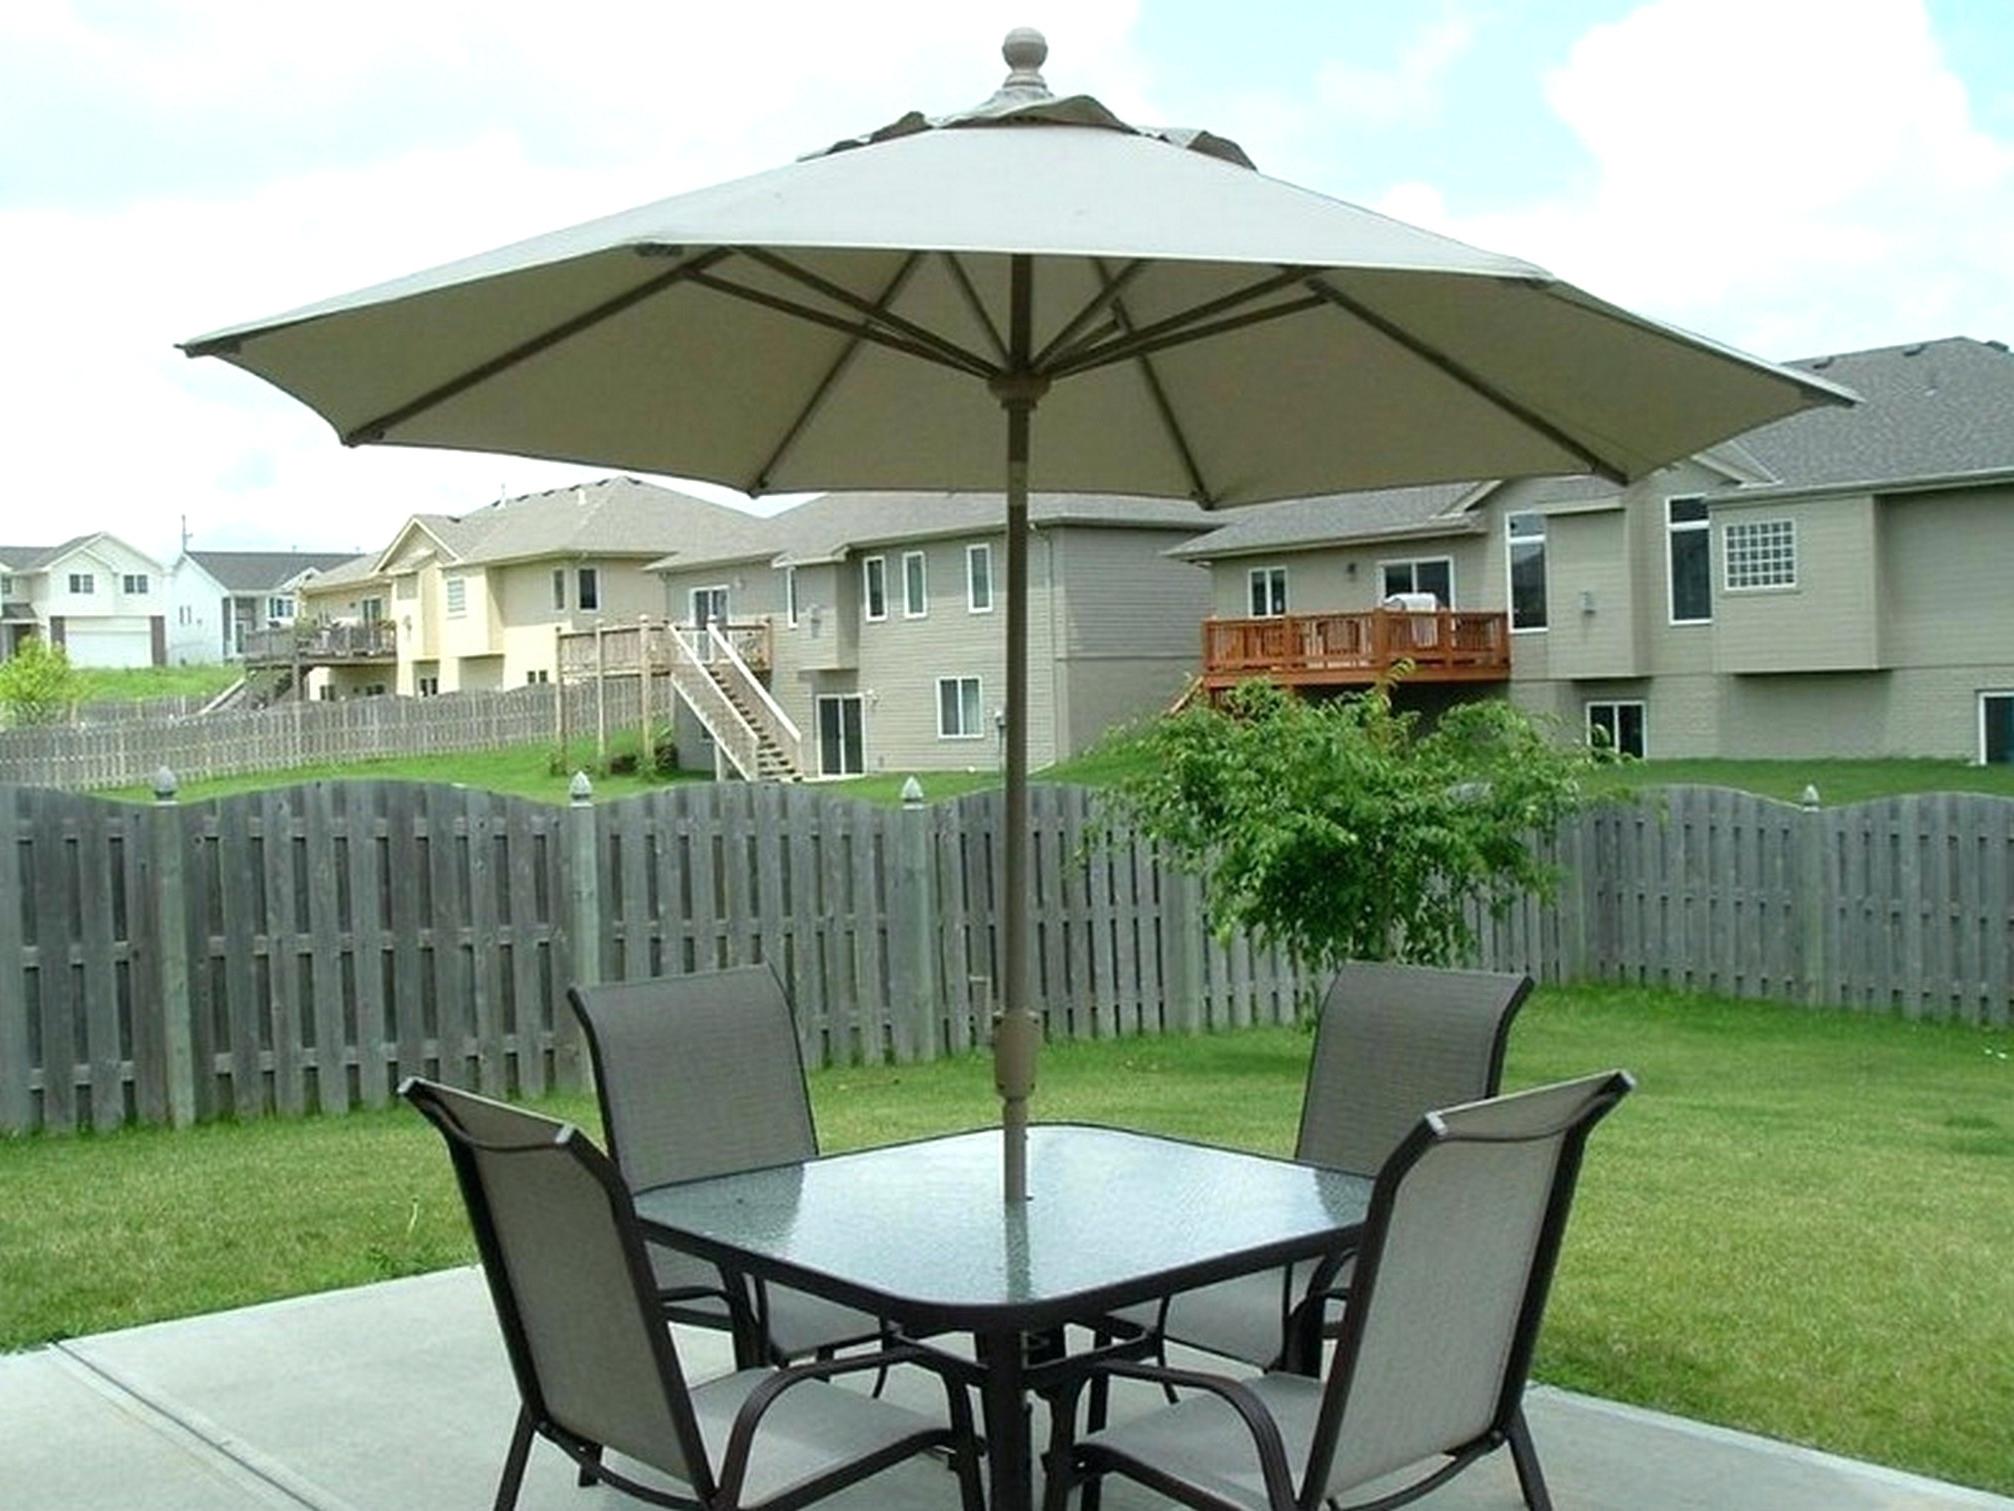 Sunbrella Teak Umbrellas With Fashionable Tips: Best Frontgate Umbrellas With Sunbrella Striped Patio Umbrella (View 16 of 20)